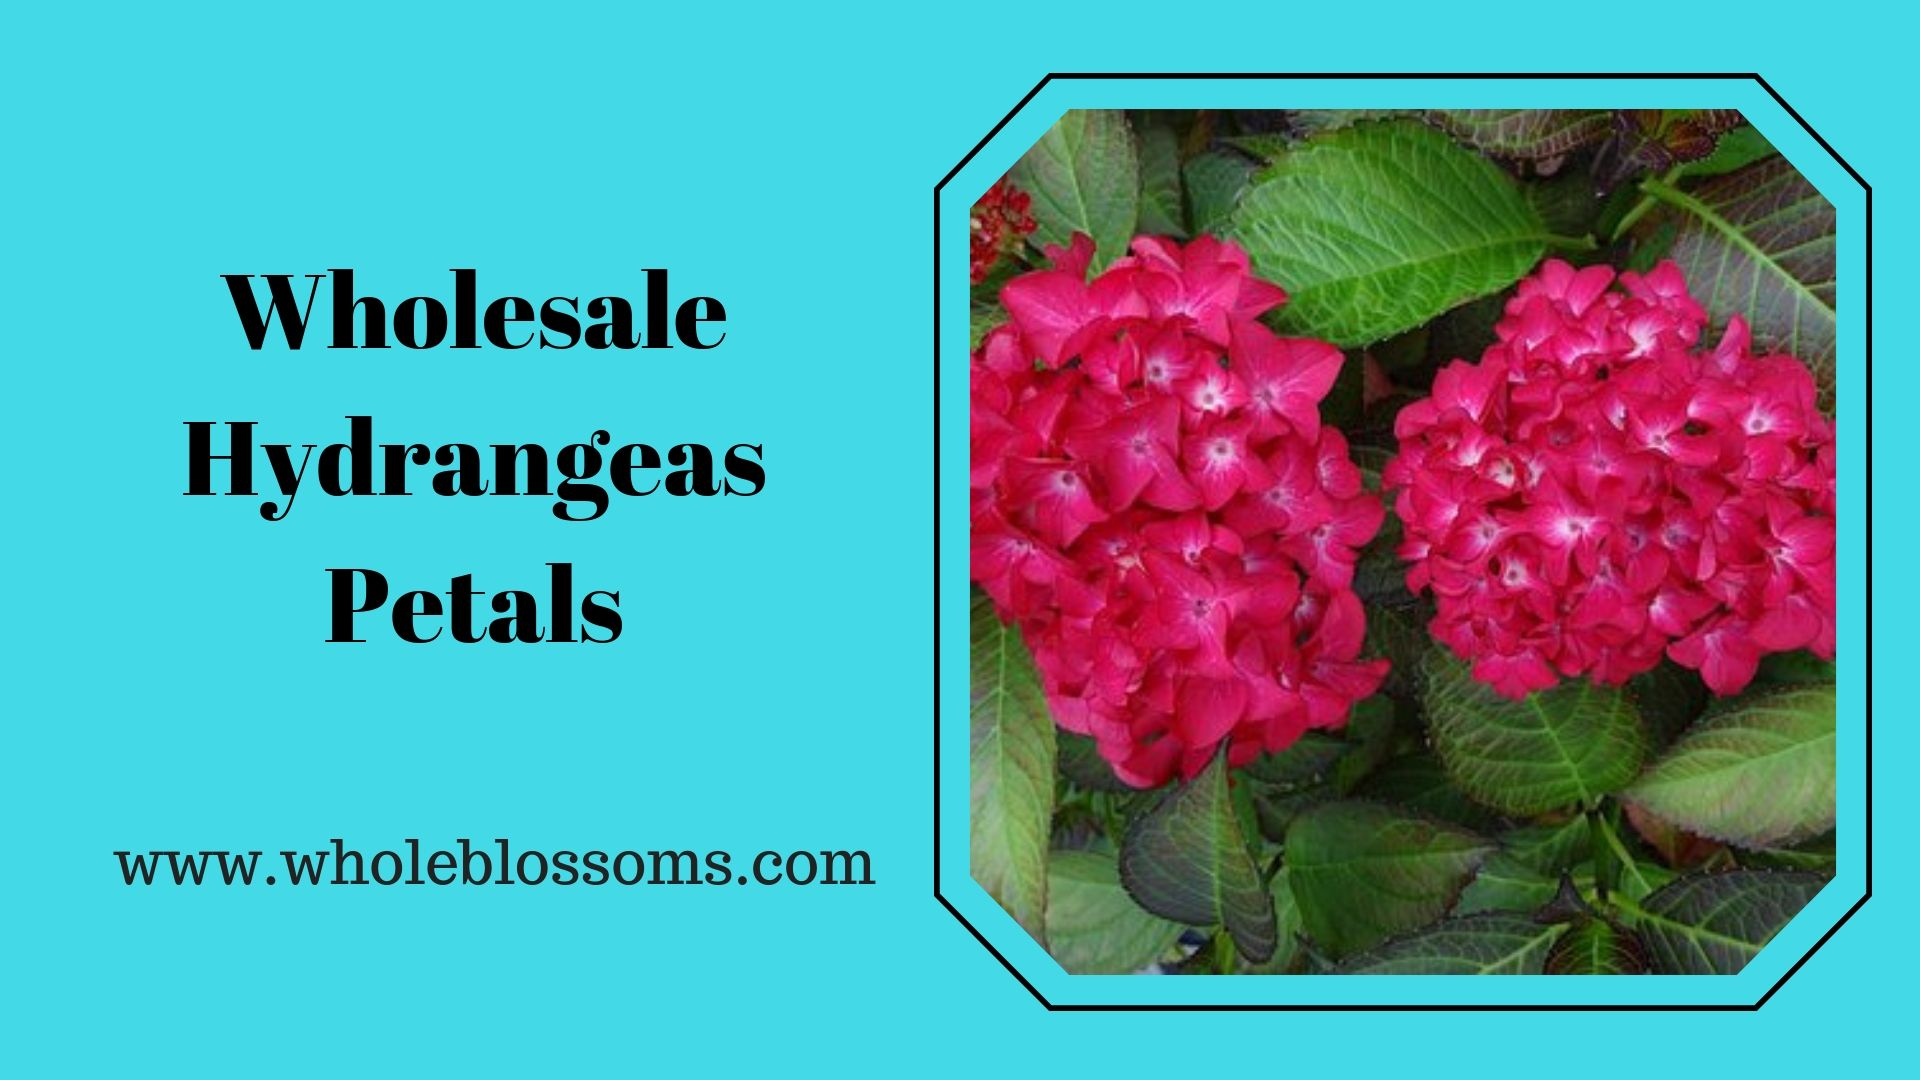 Order Wholesale Hydrangeas Flowers From Whole Blossoms Hydrangea Flower Flowers For Sale Hydrangea